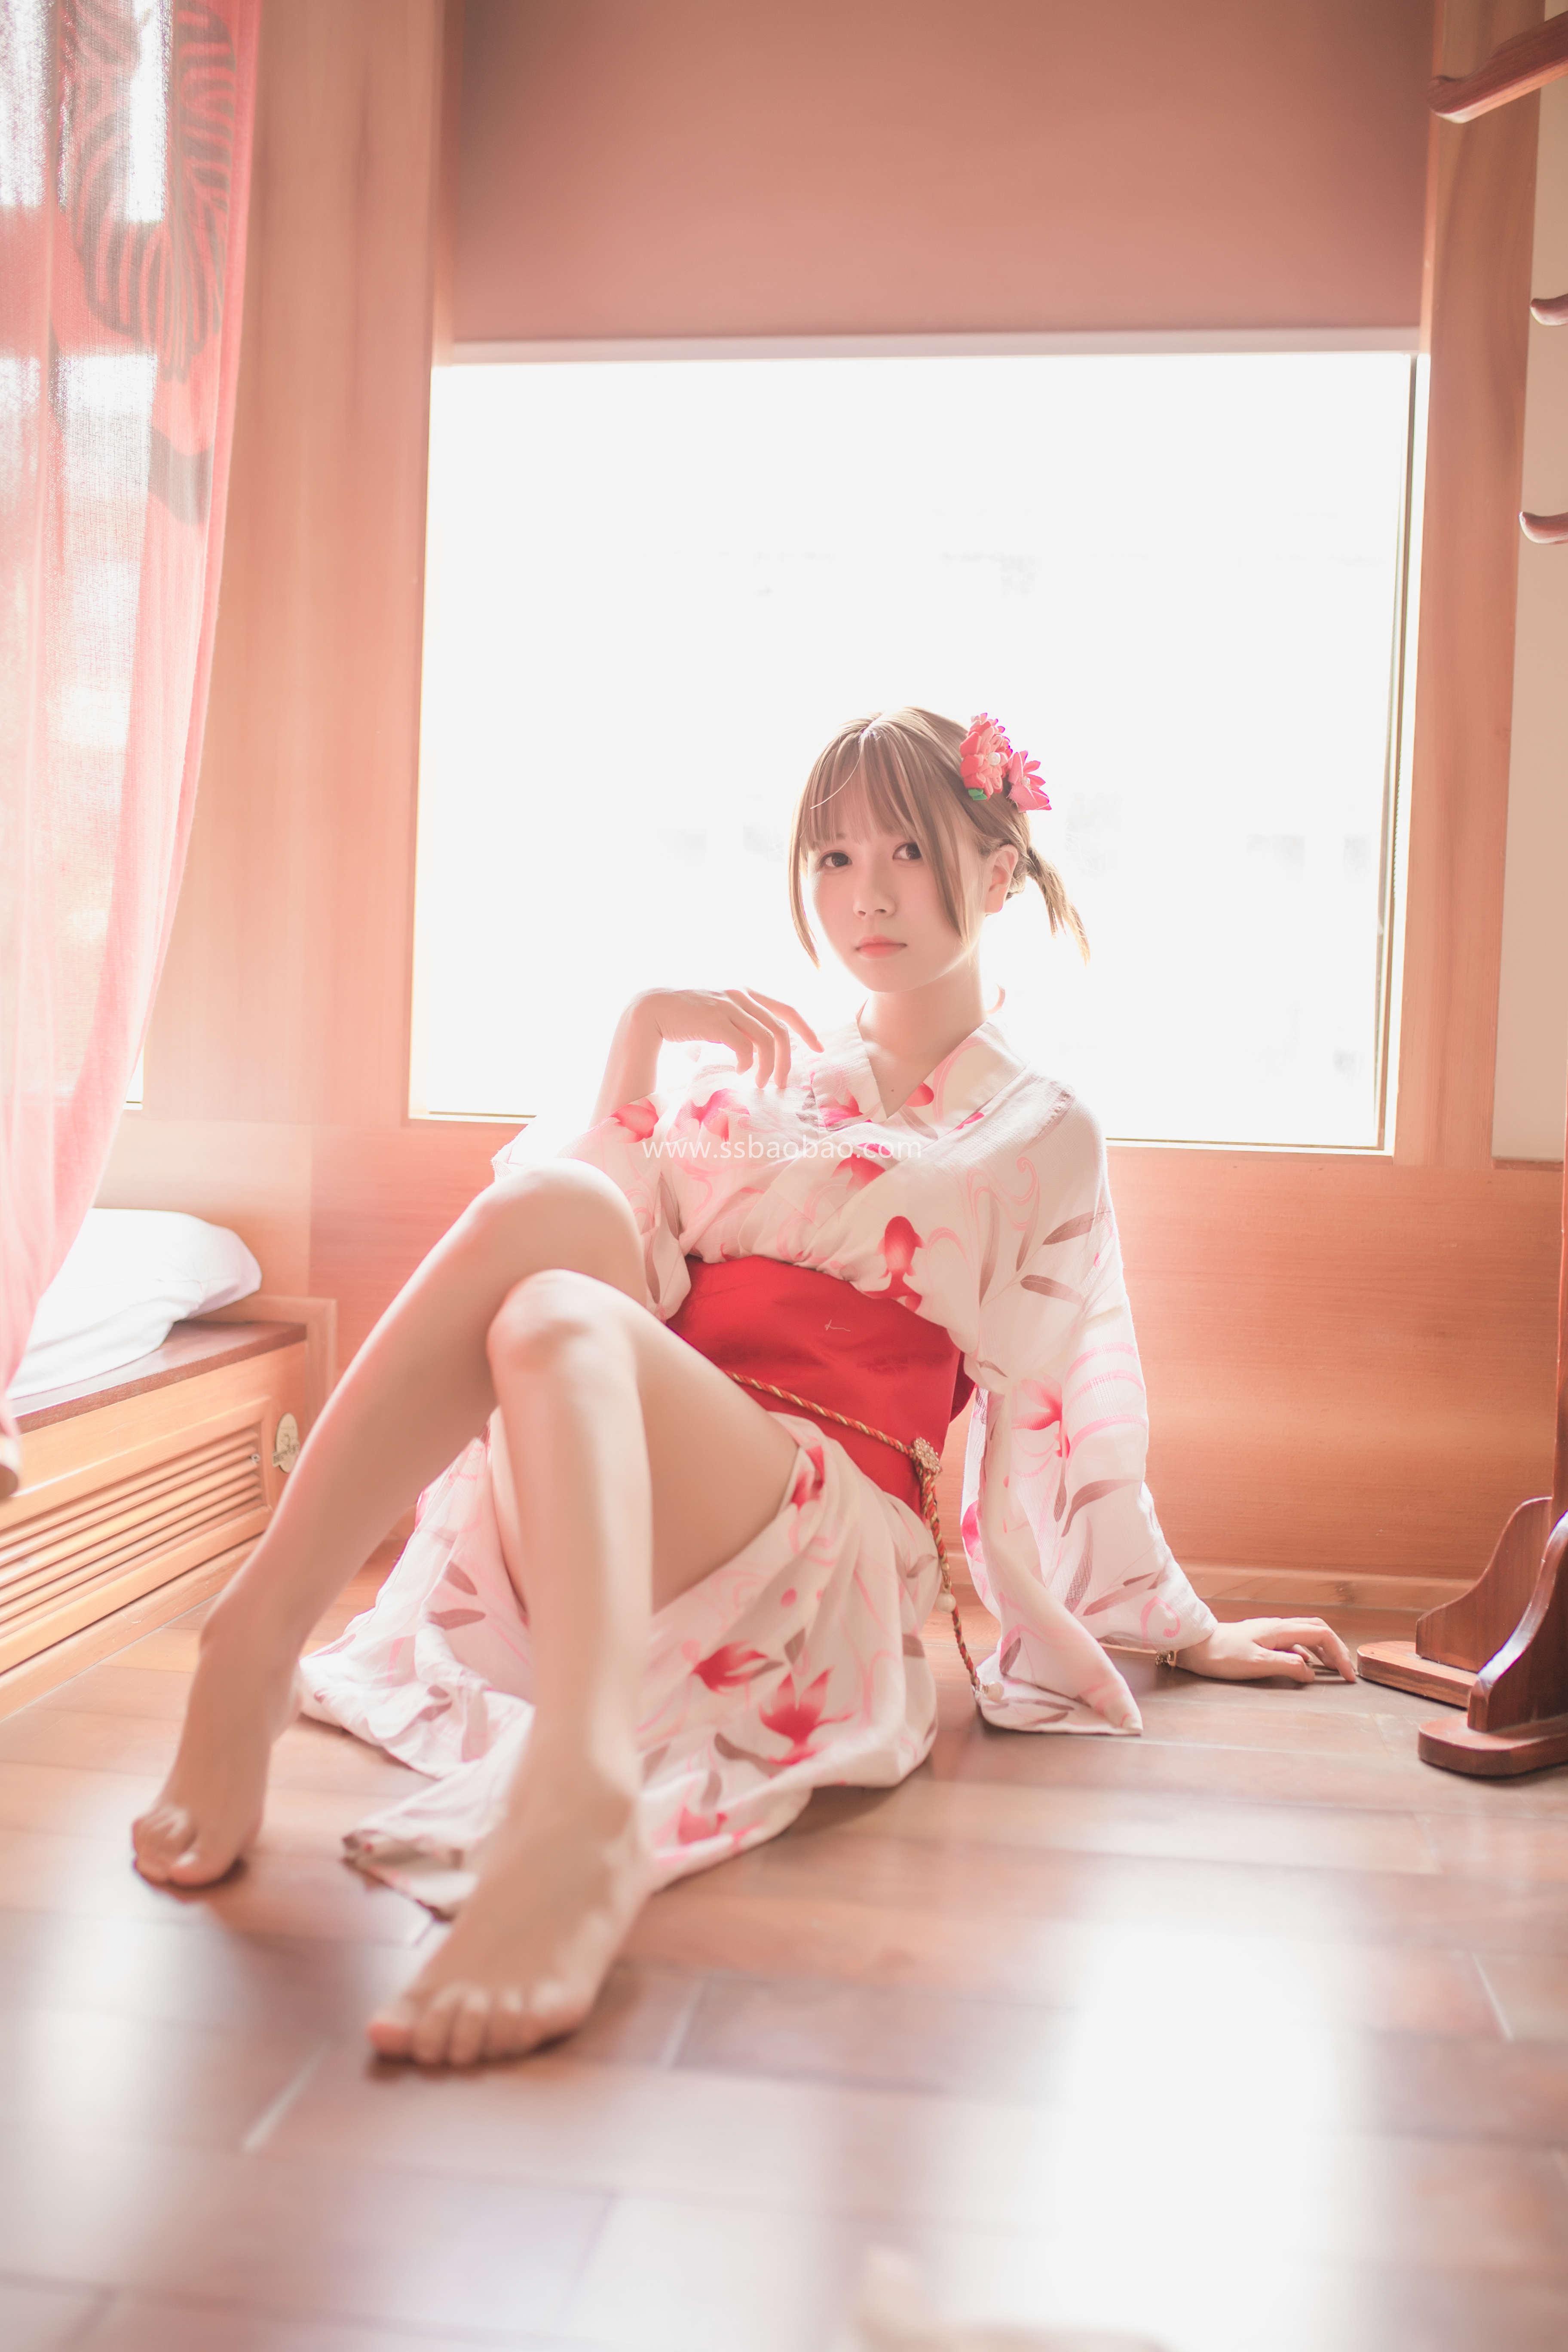 Yoko宅夏 - 妹汤物语(和服)[53P-313MB]05